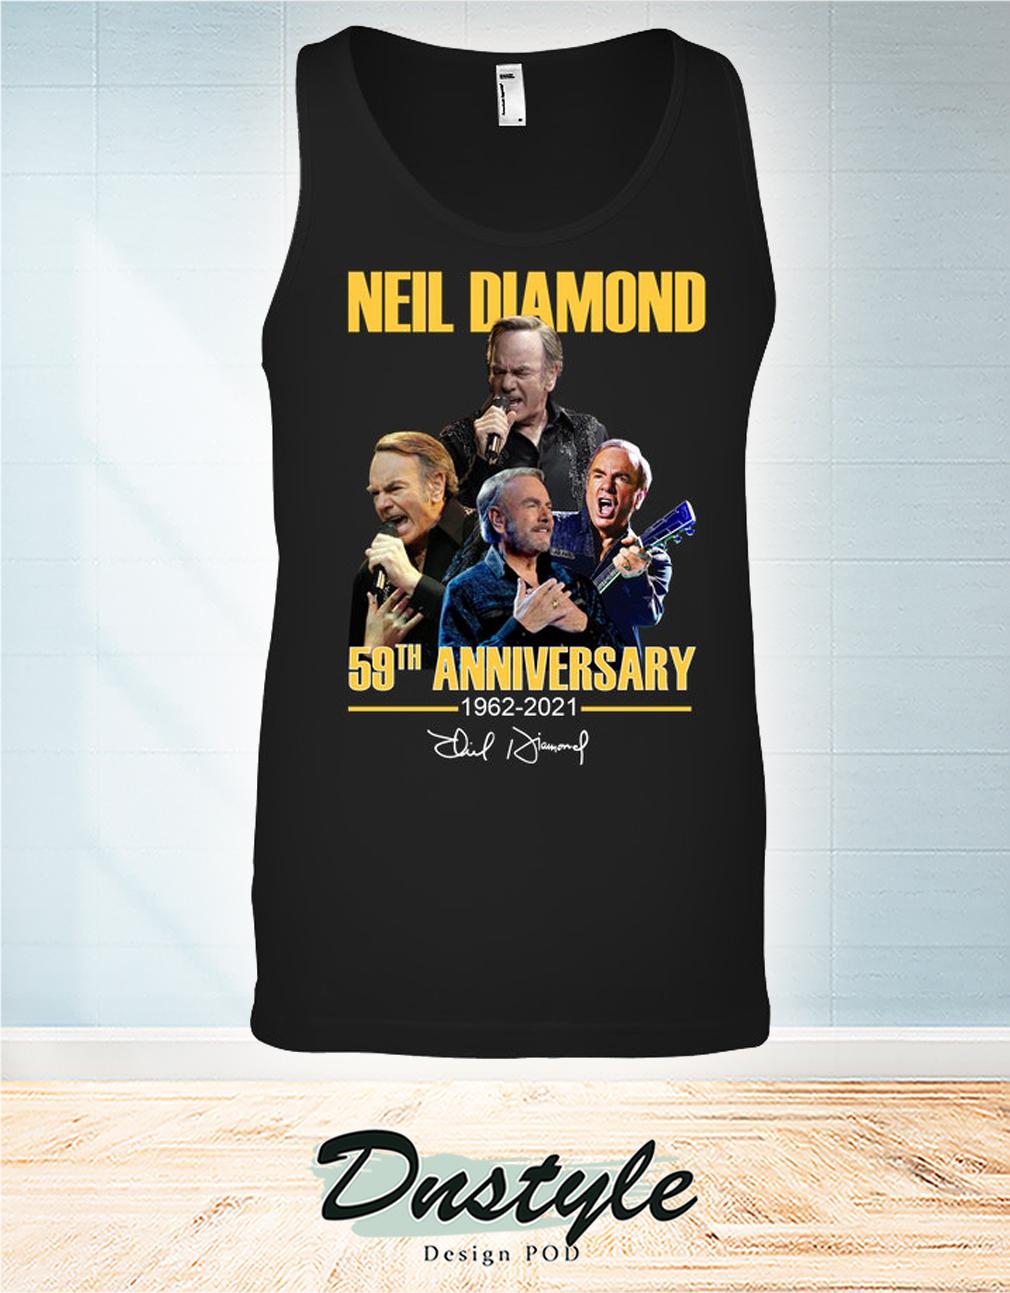 Neil Diamond 59th anniversary 1962 2021 signature tank top